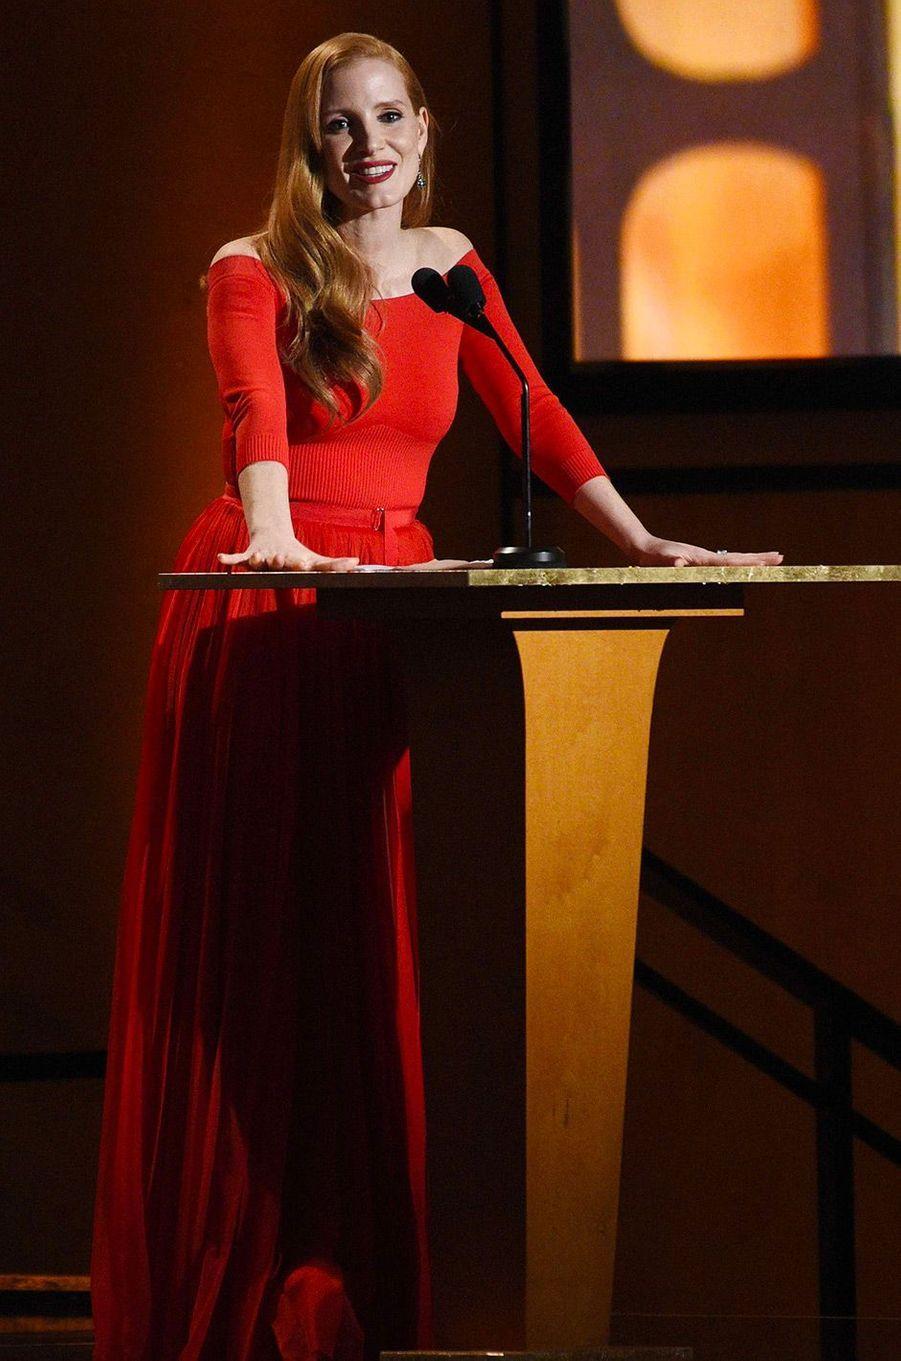 Jessica Chastain aux Governors Awards à Los Angeles, samedi 11 novembre